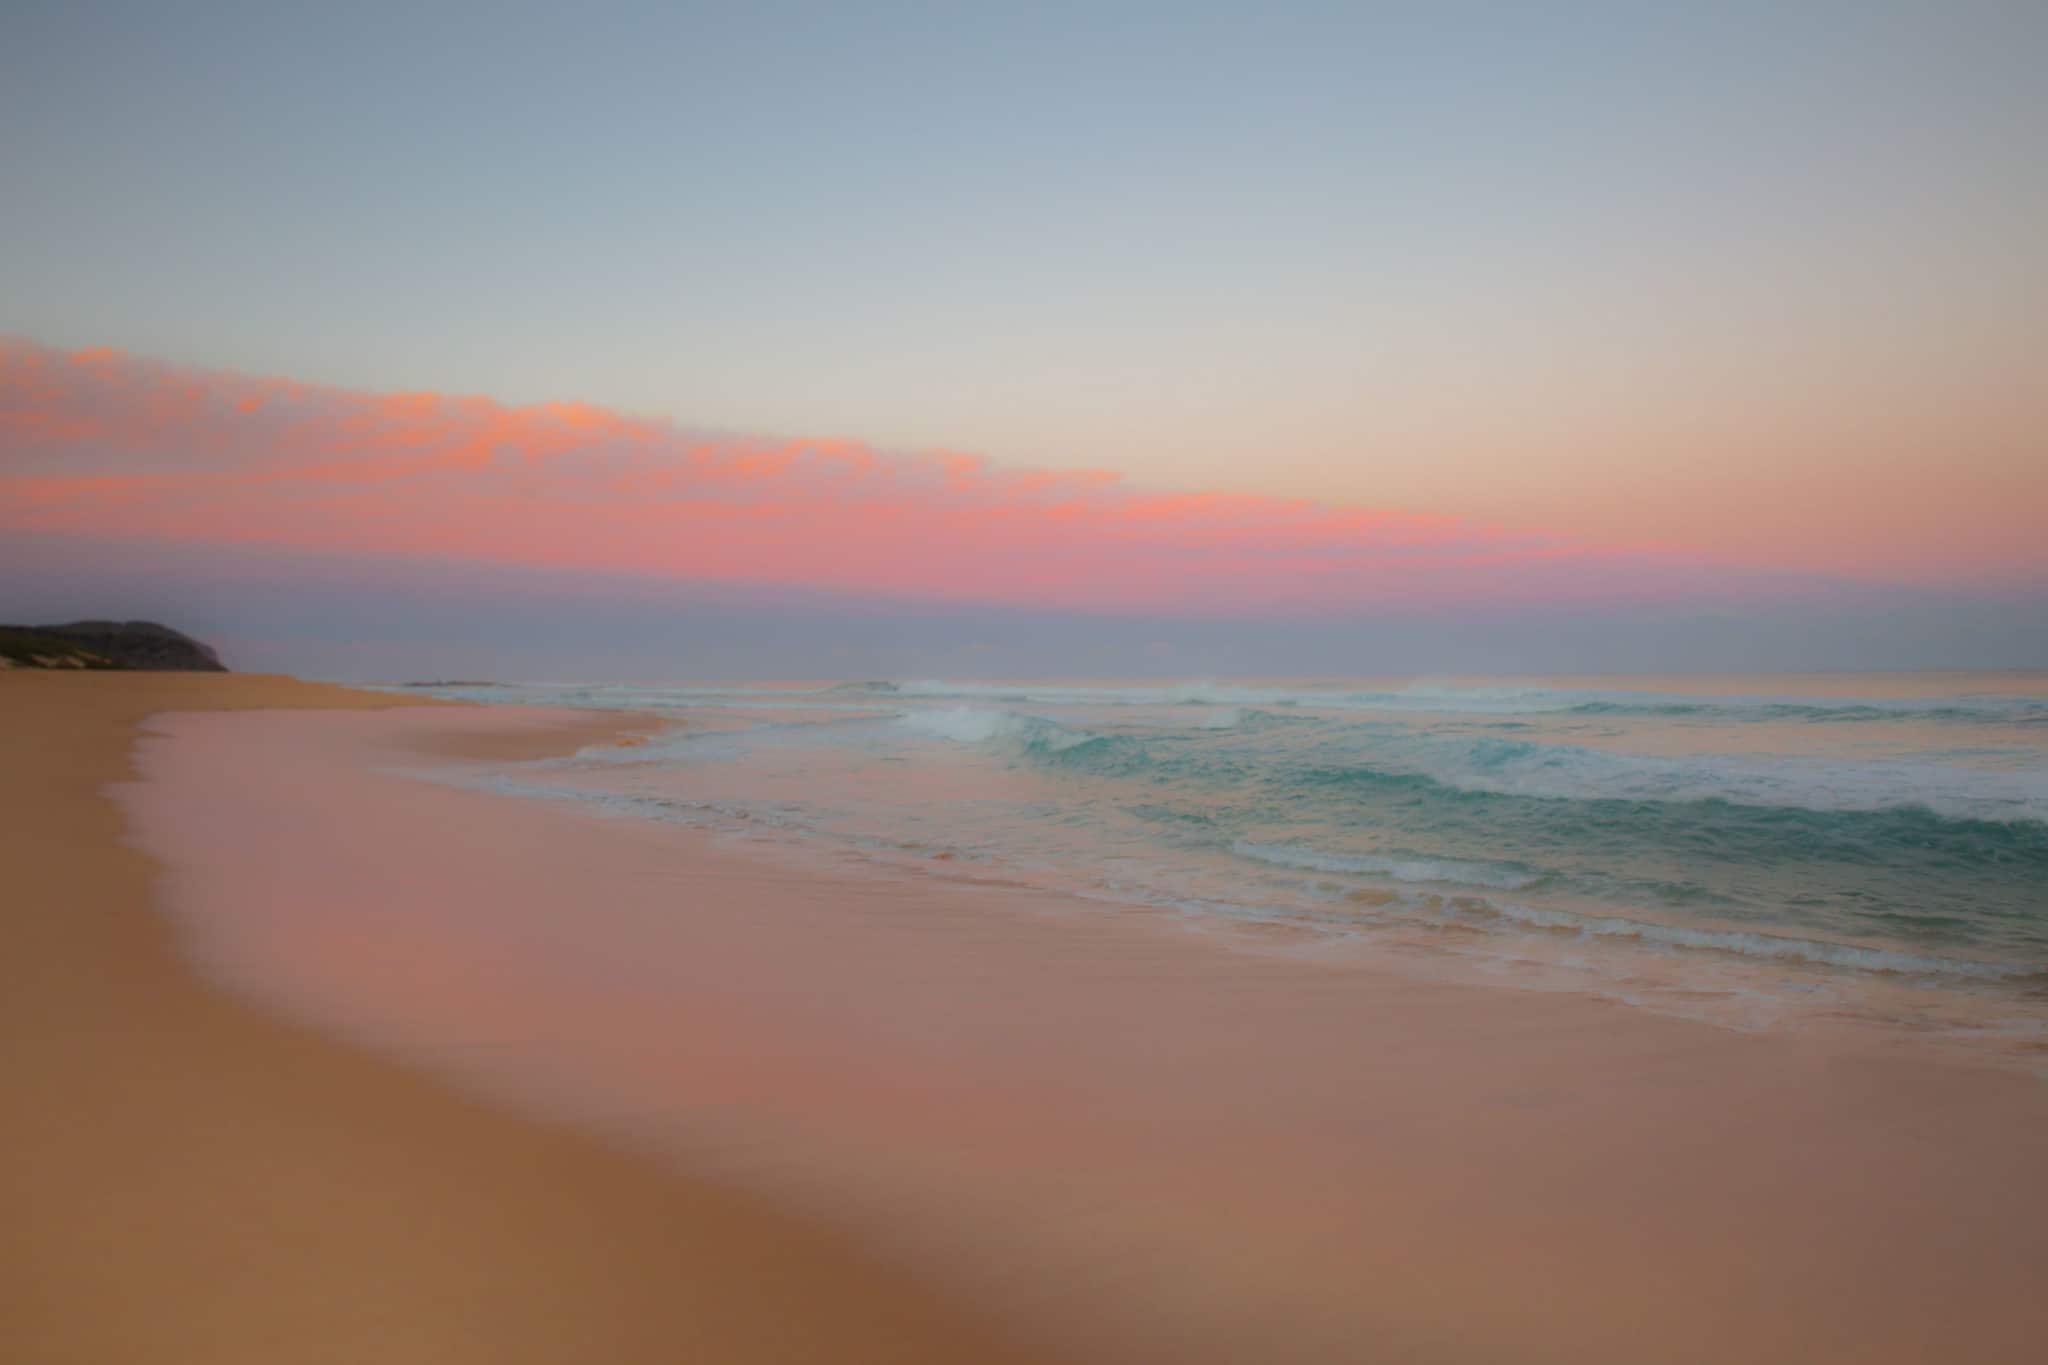 TravelwithMeraki-Sunrise-Wamberal Beach-New South Wales-Australia